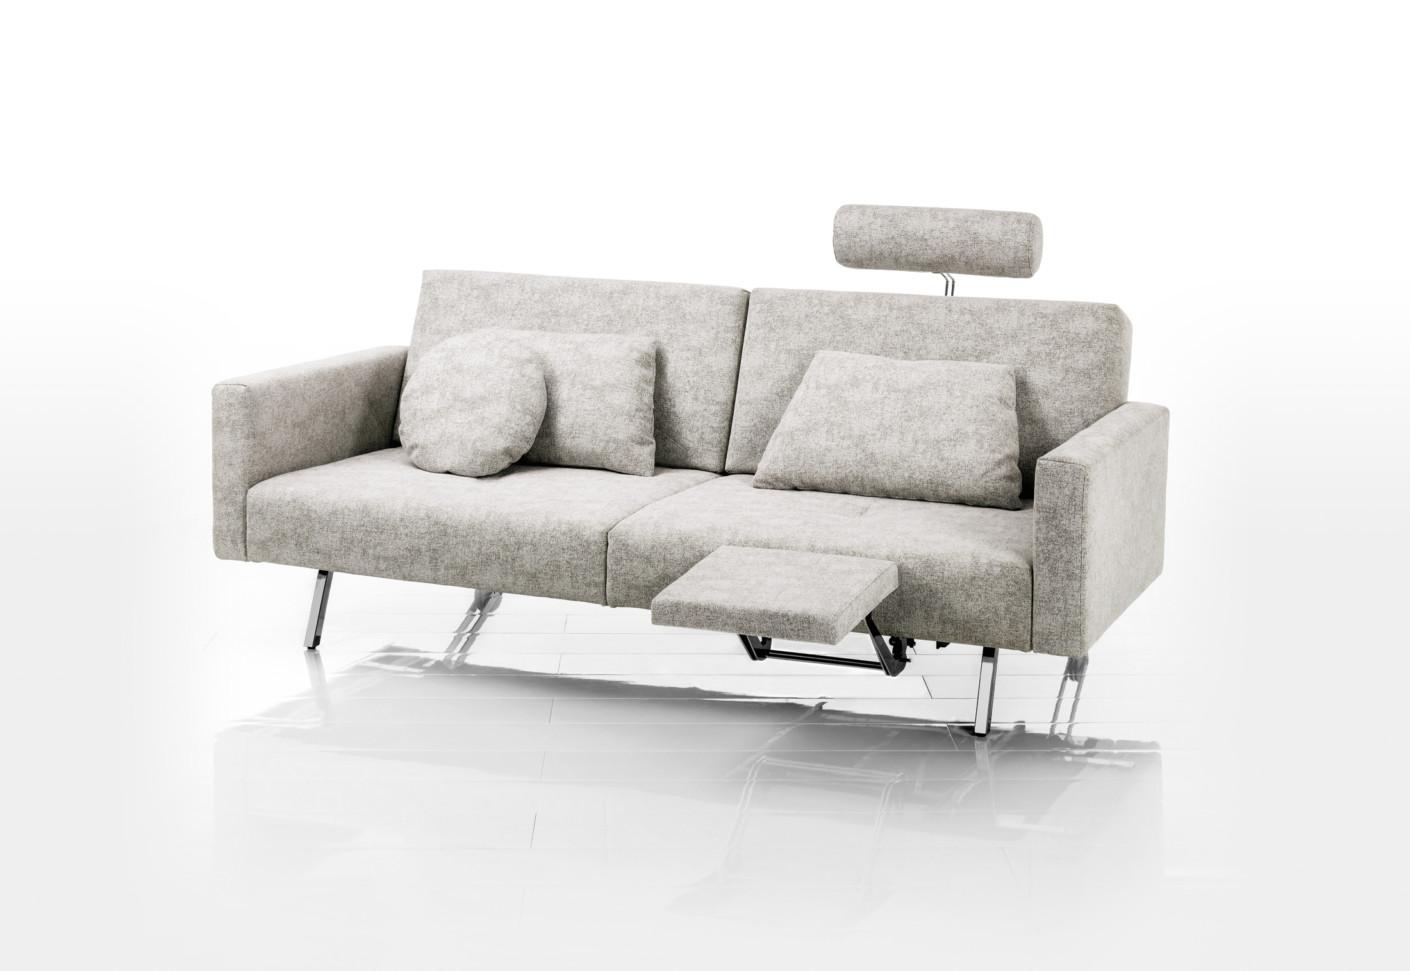 Сoncert Sofa Collection by Brühl